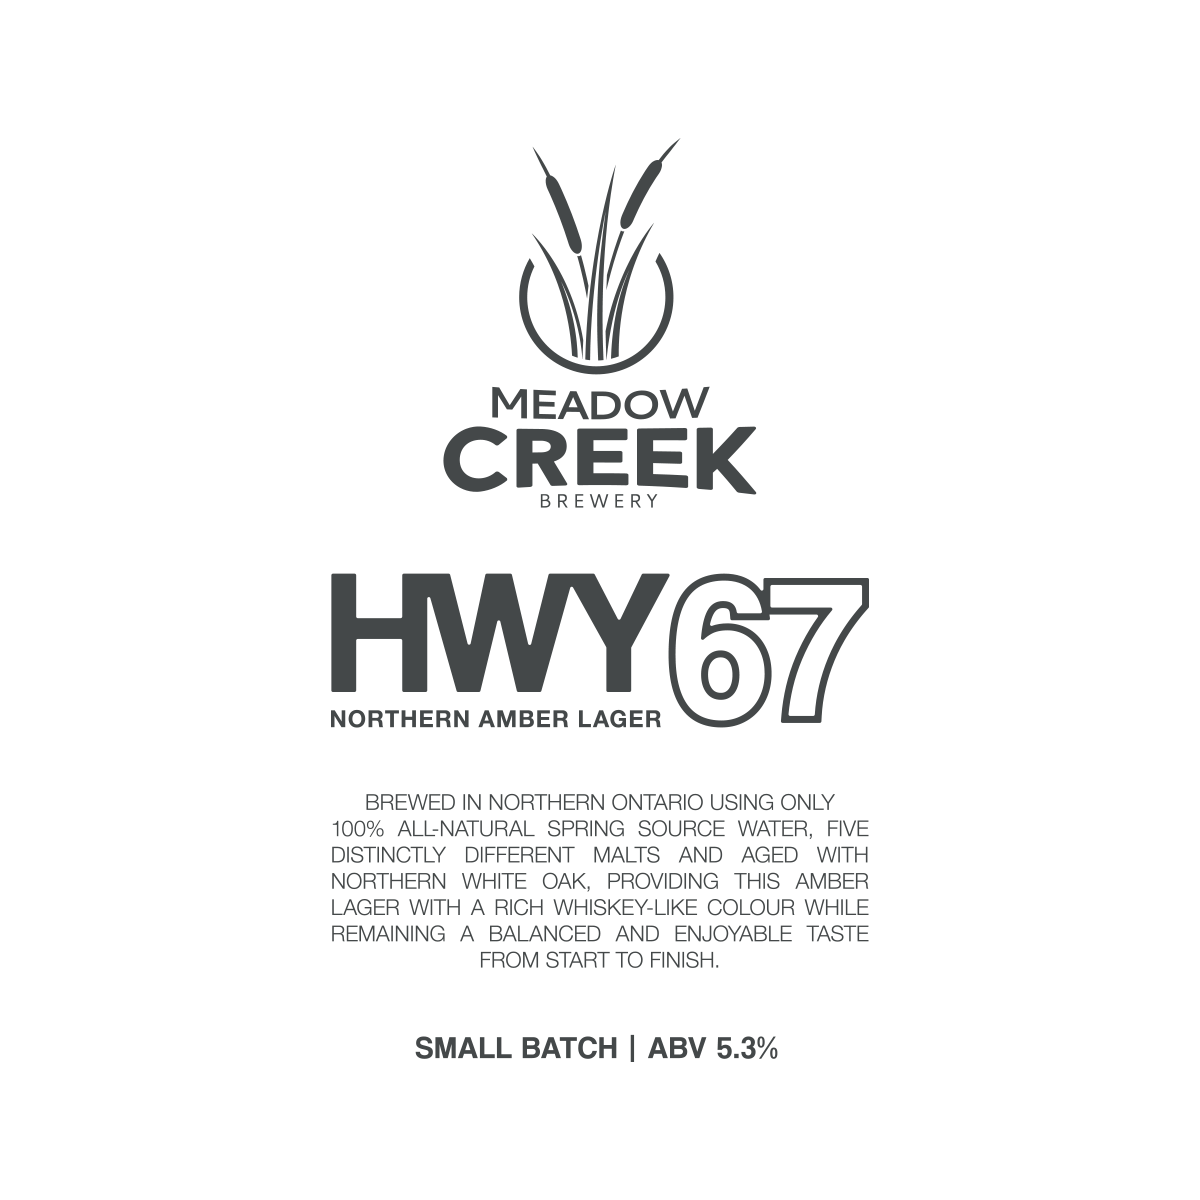 Meadow Creek Small Batch Brewery Label Design